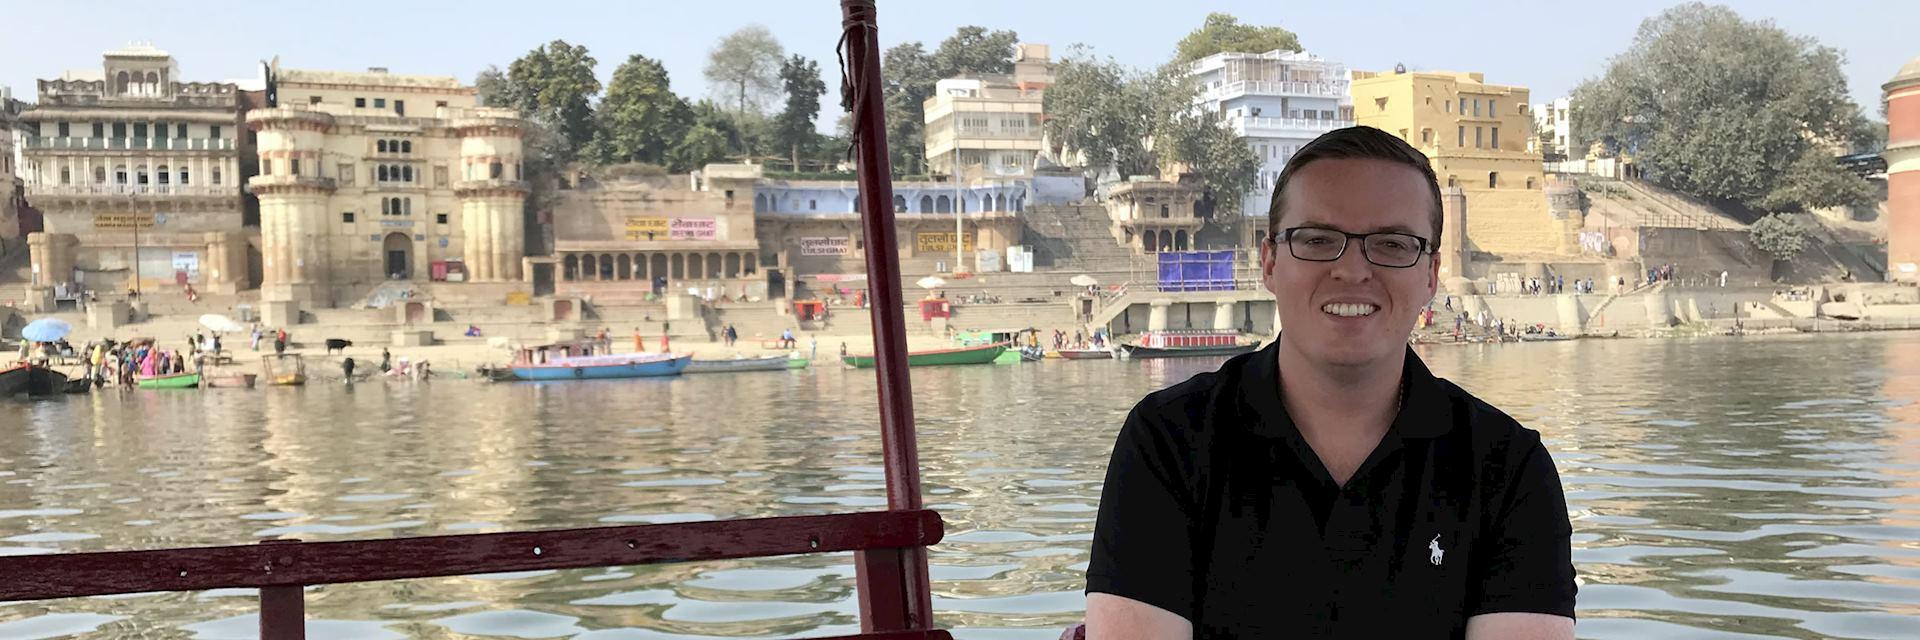 Jason on a Boat trip to the Ghats, Varanasi